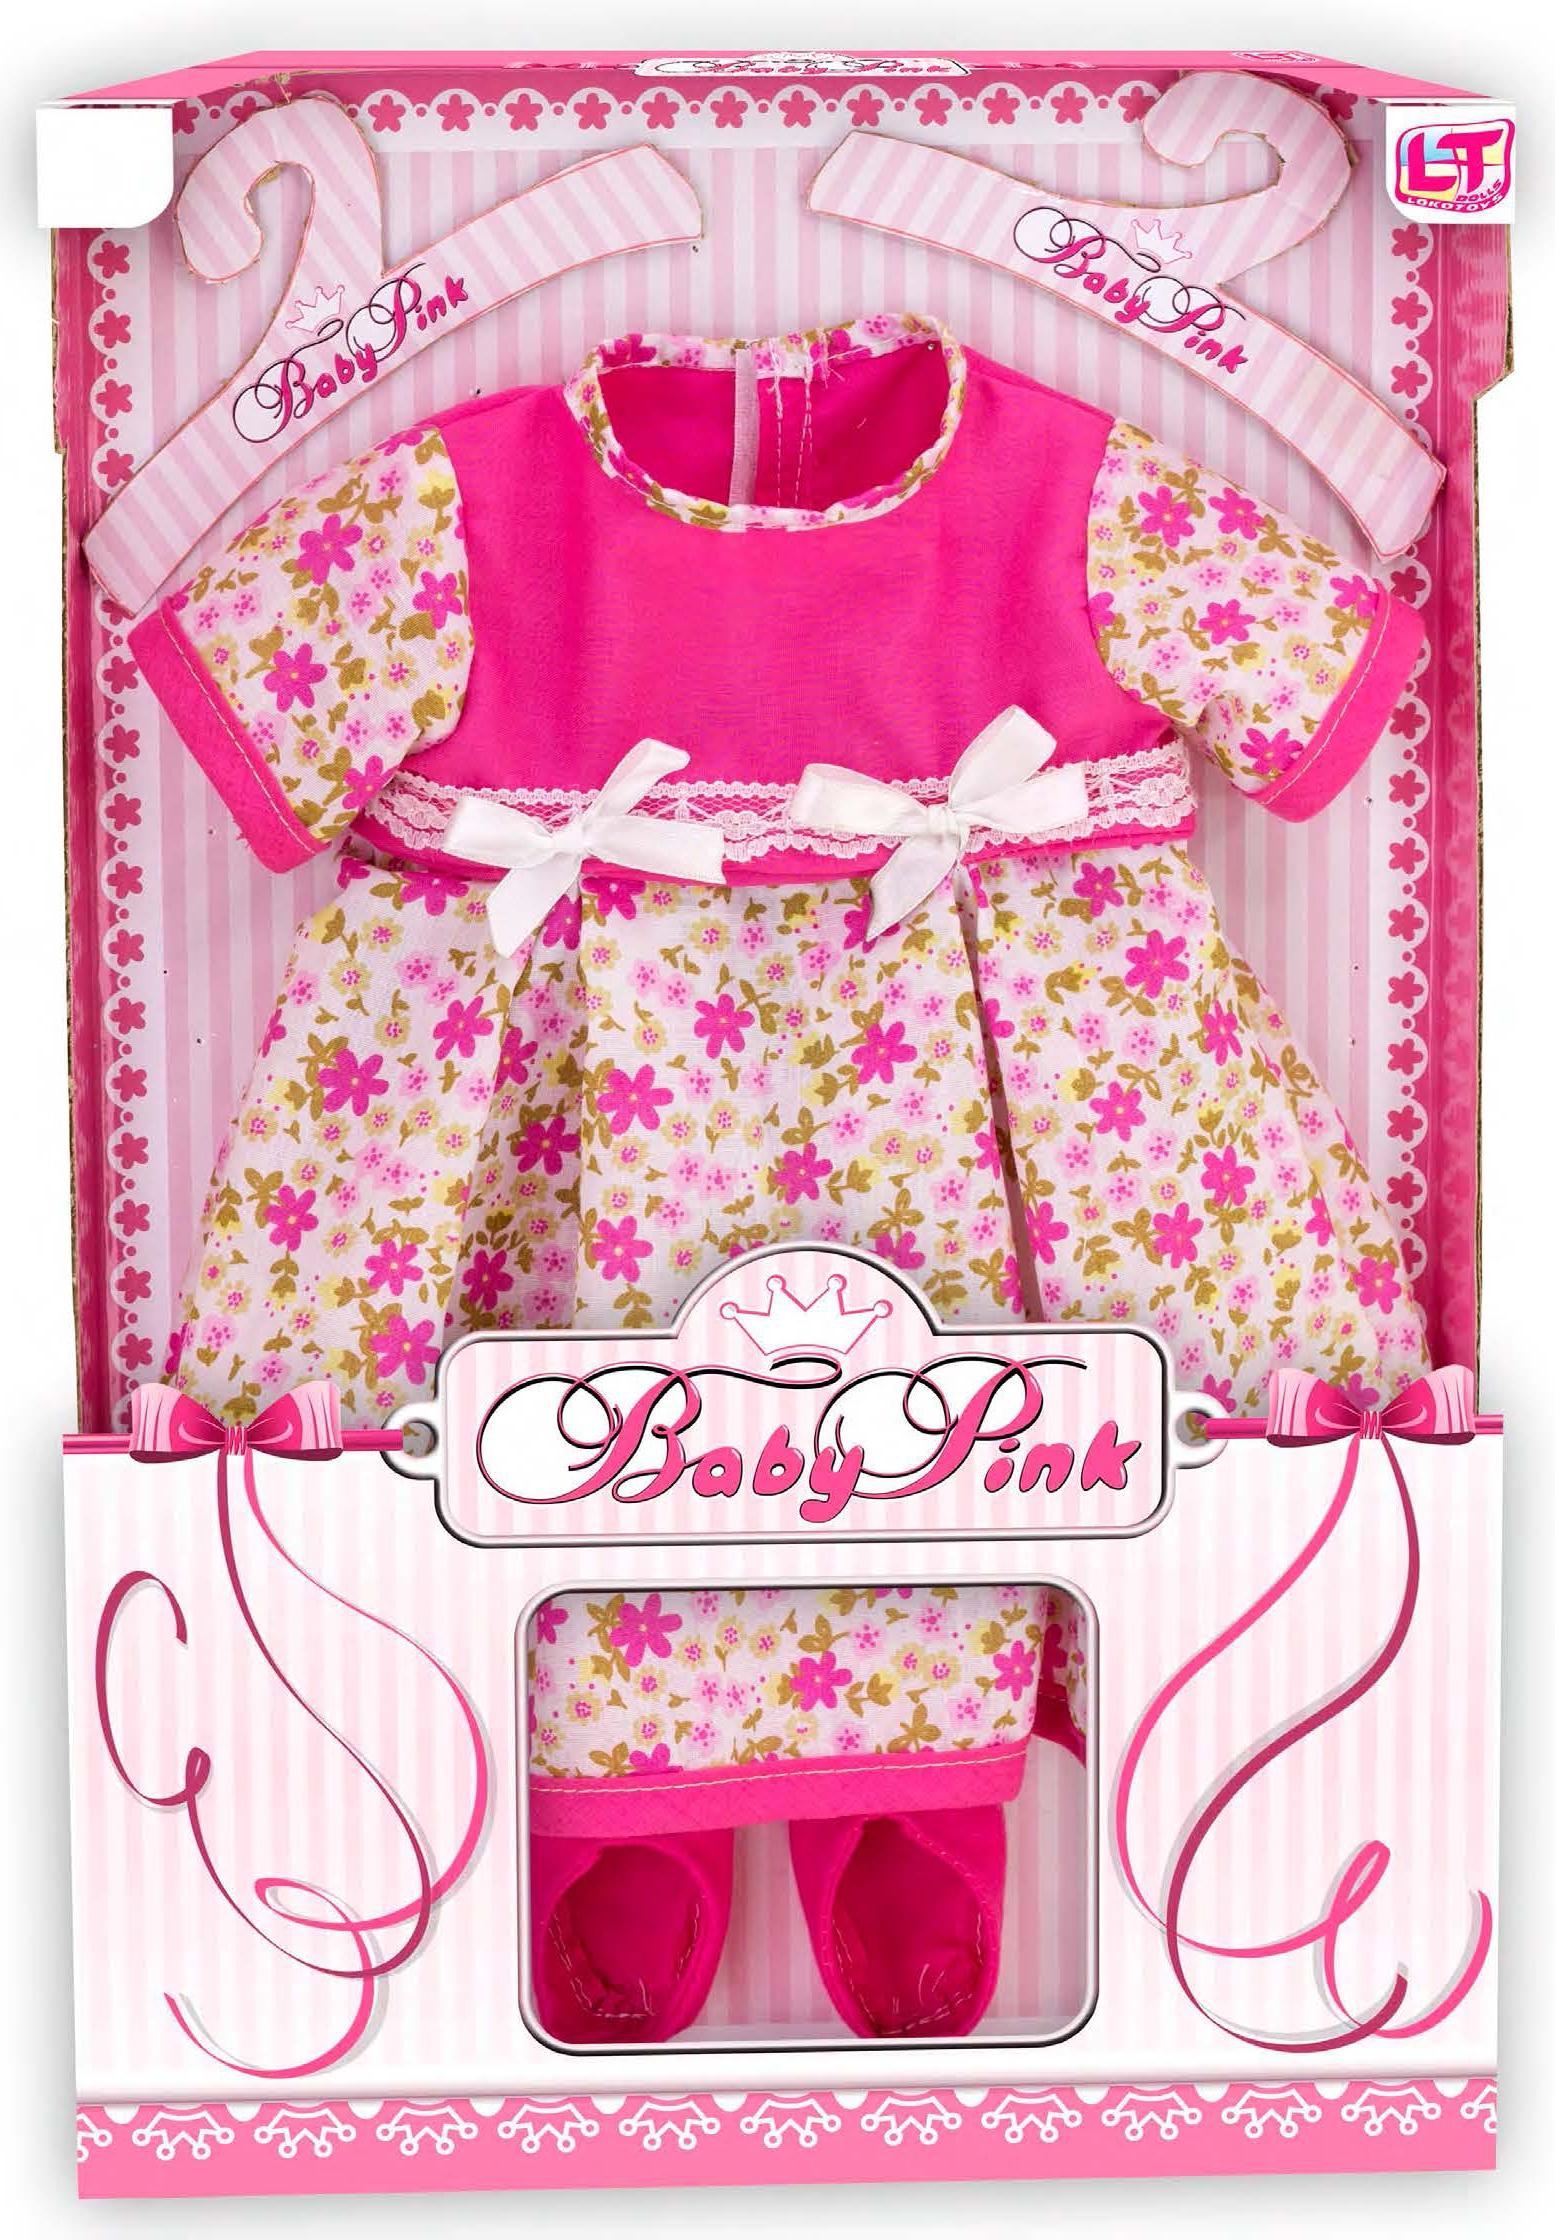 Одежда для кукол LokoToys Одежда для куклы девочки Baby Pink - 98224 куклы и одежда для кукол famosa кукла нэнси волшебный поцелуй